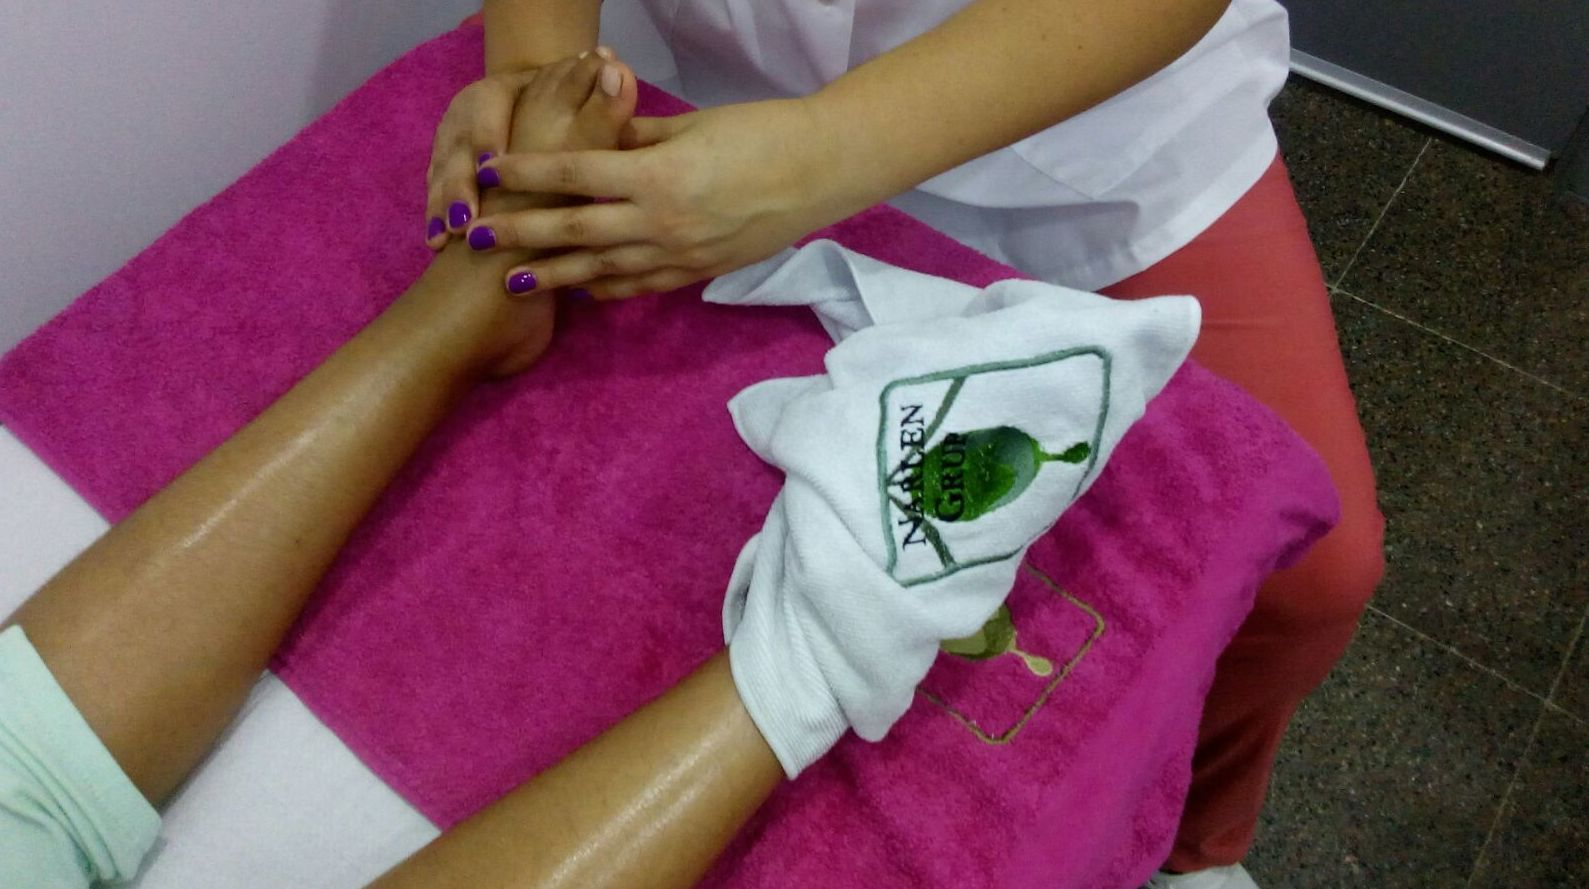 Massatge terapèutic i reflexología podal  : Servicios de BNT MEDyPLUS